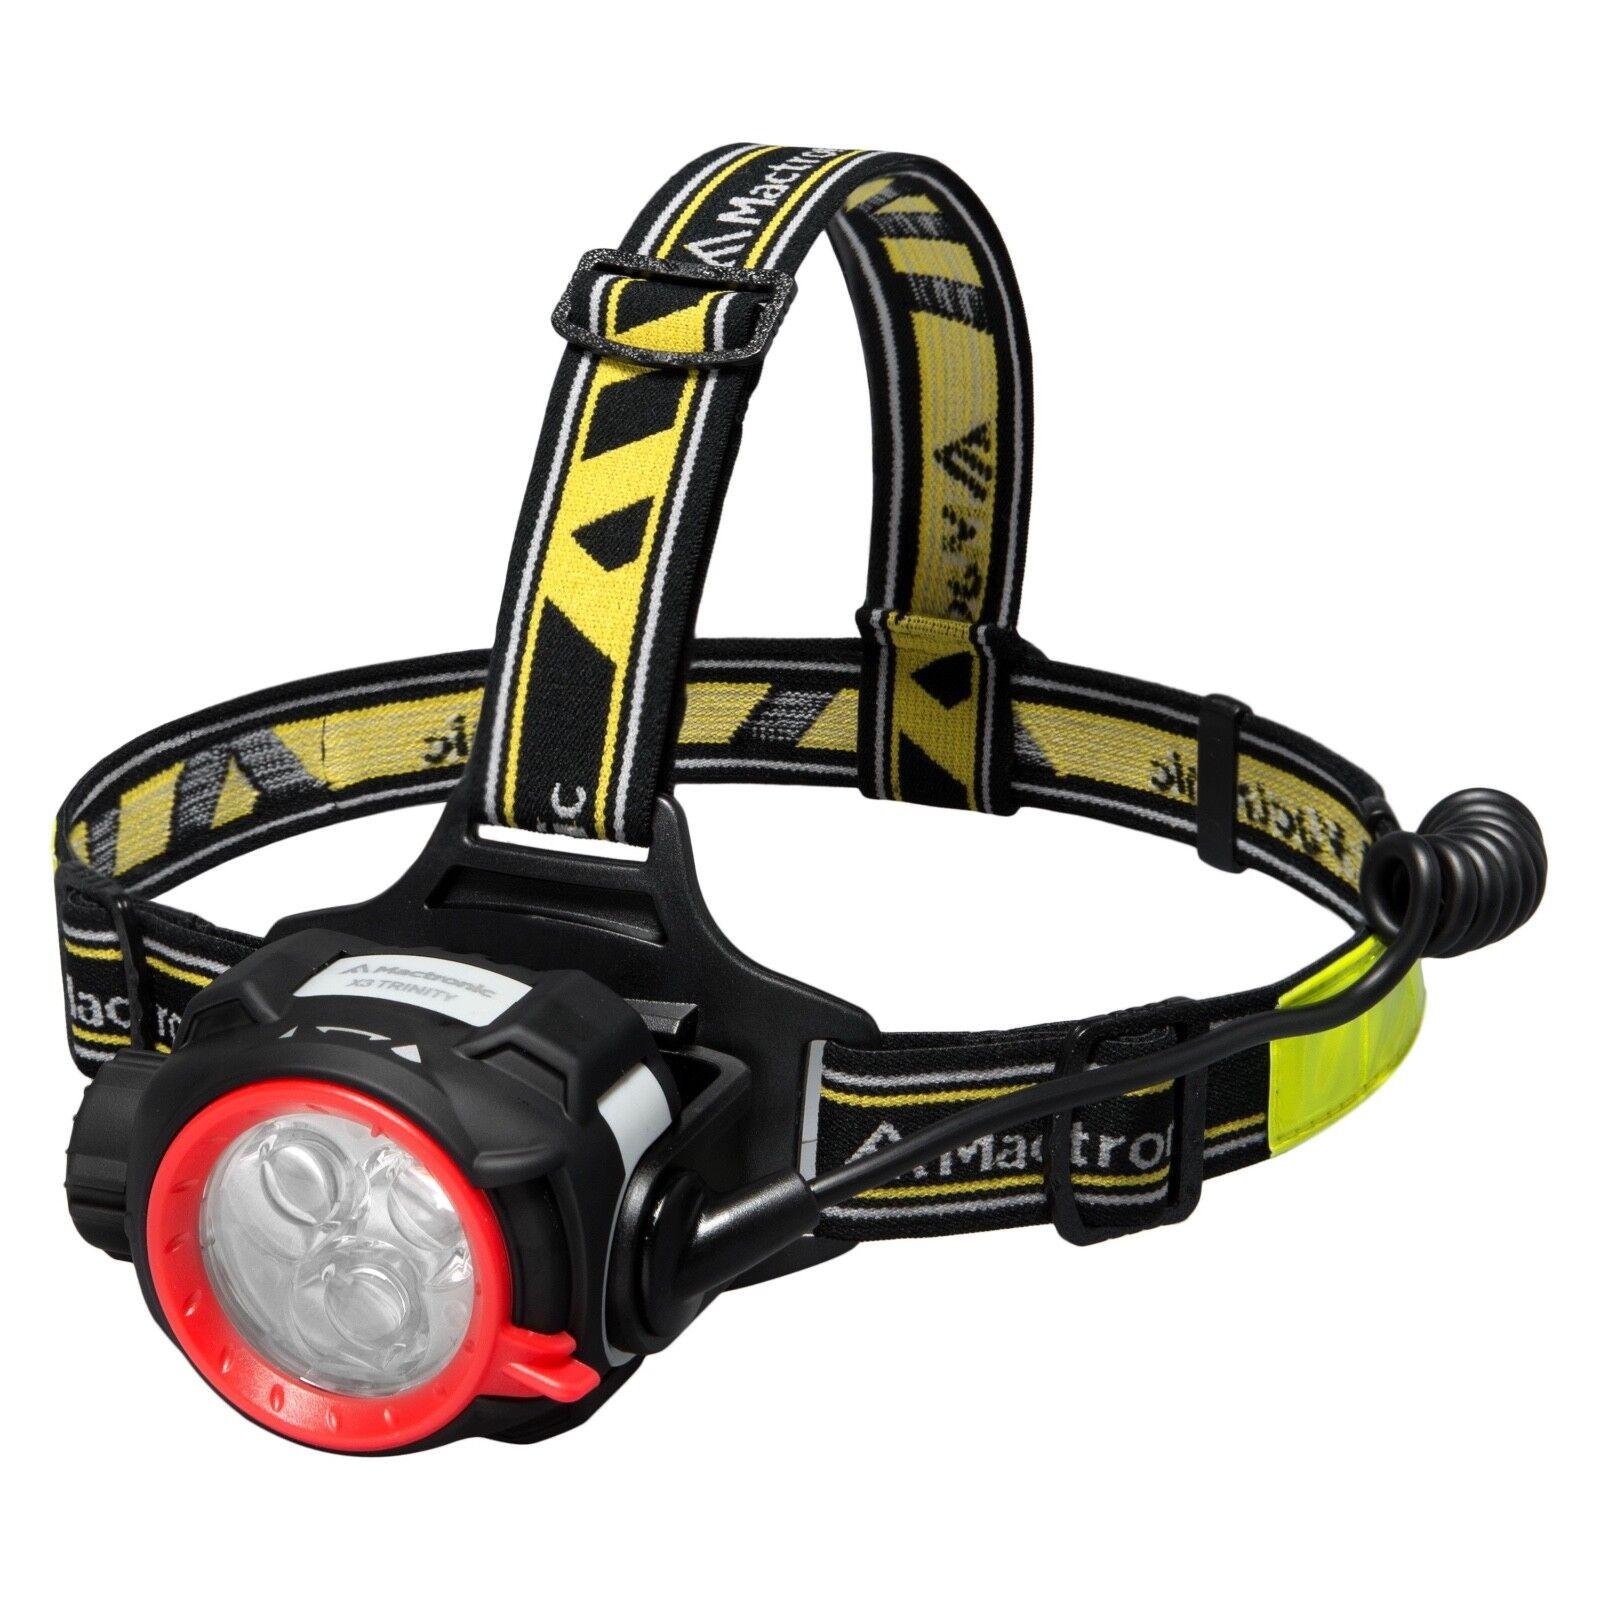 Mactronic LED Stirnlampe X3 Trinity 375lm Outdoor Outdoor Outdoor Kopflampe  | Ausgezeichneter Wert  e3713c